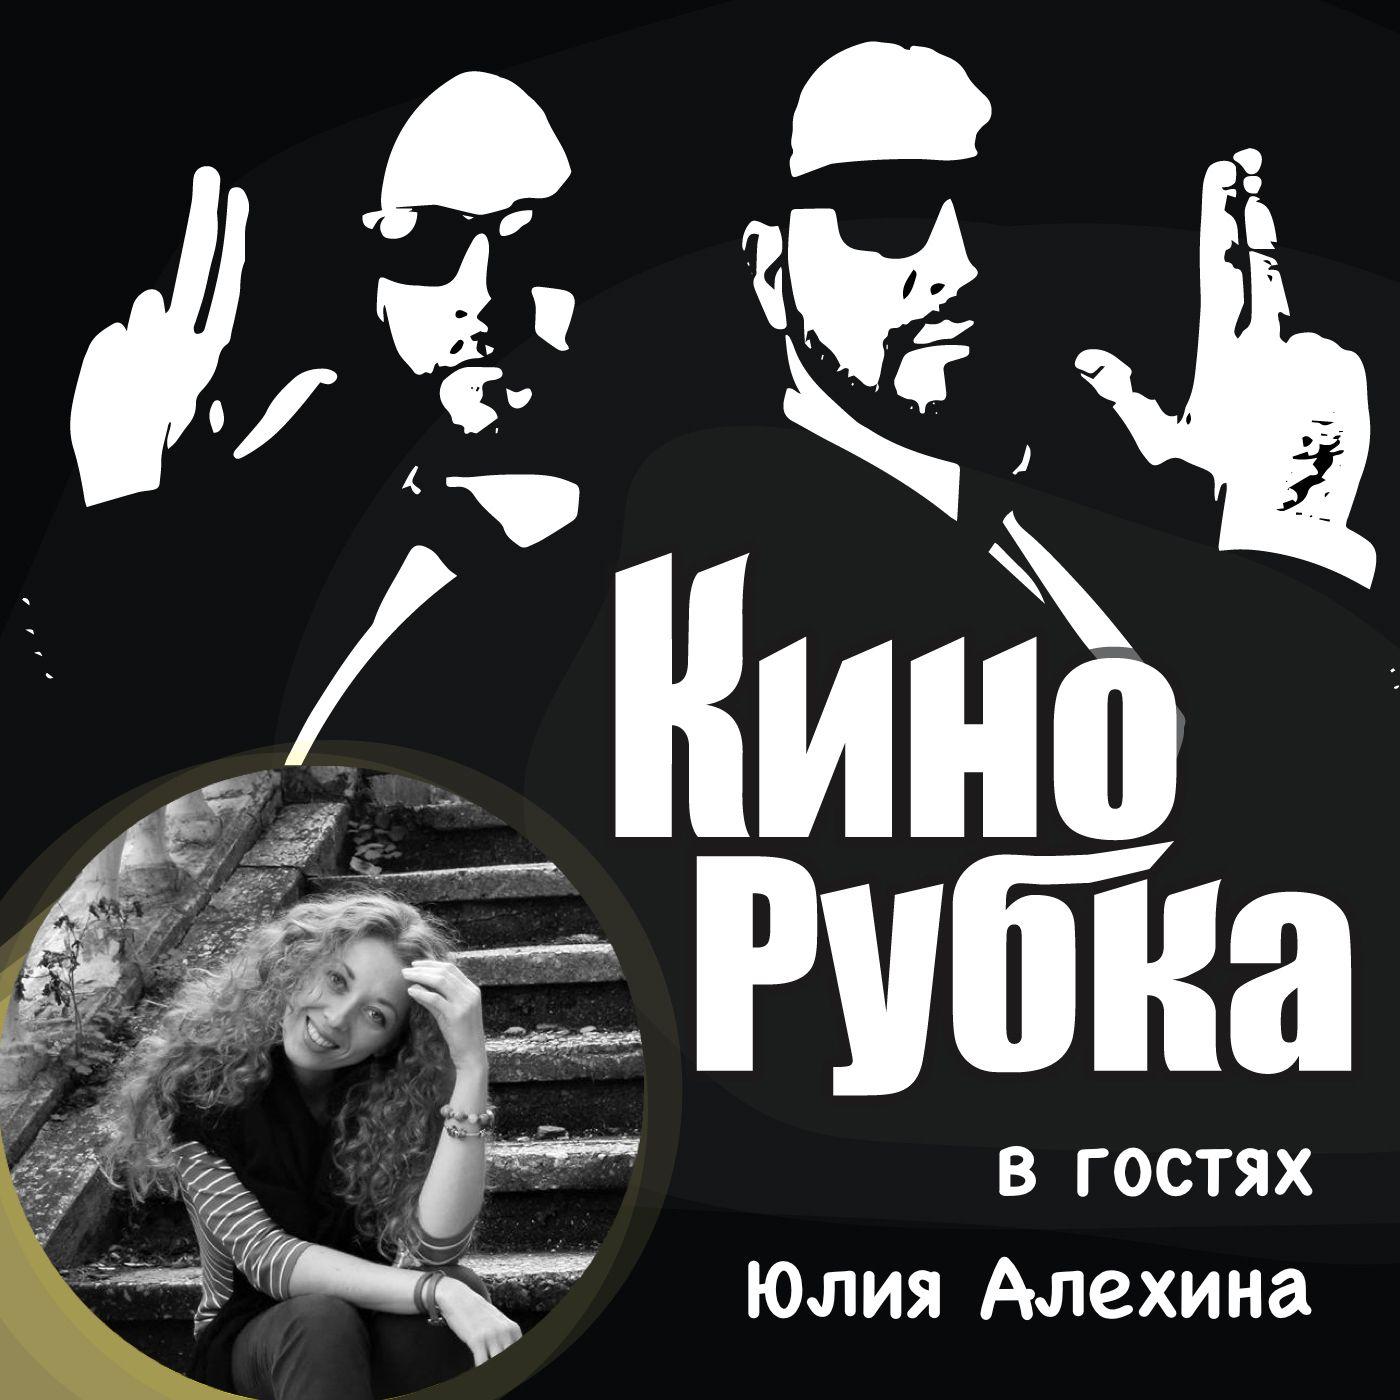 Сценарист Юлия Алехина